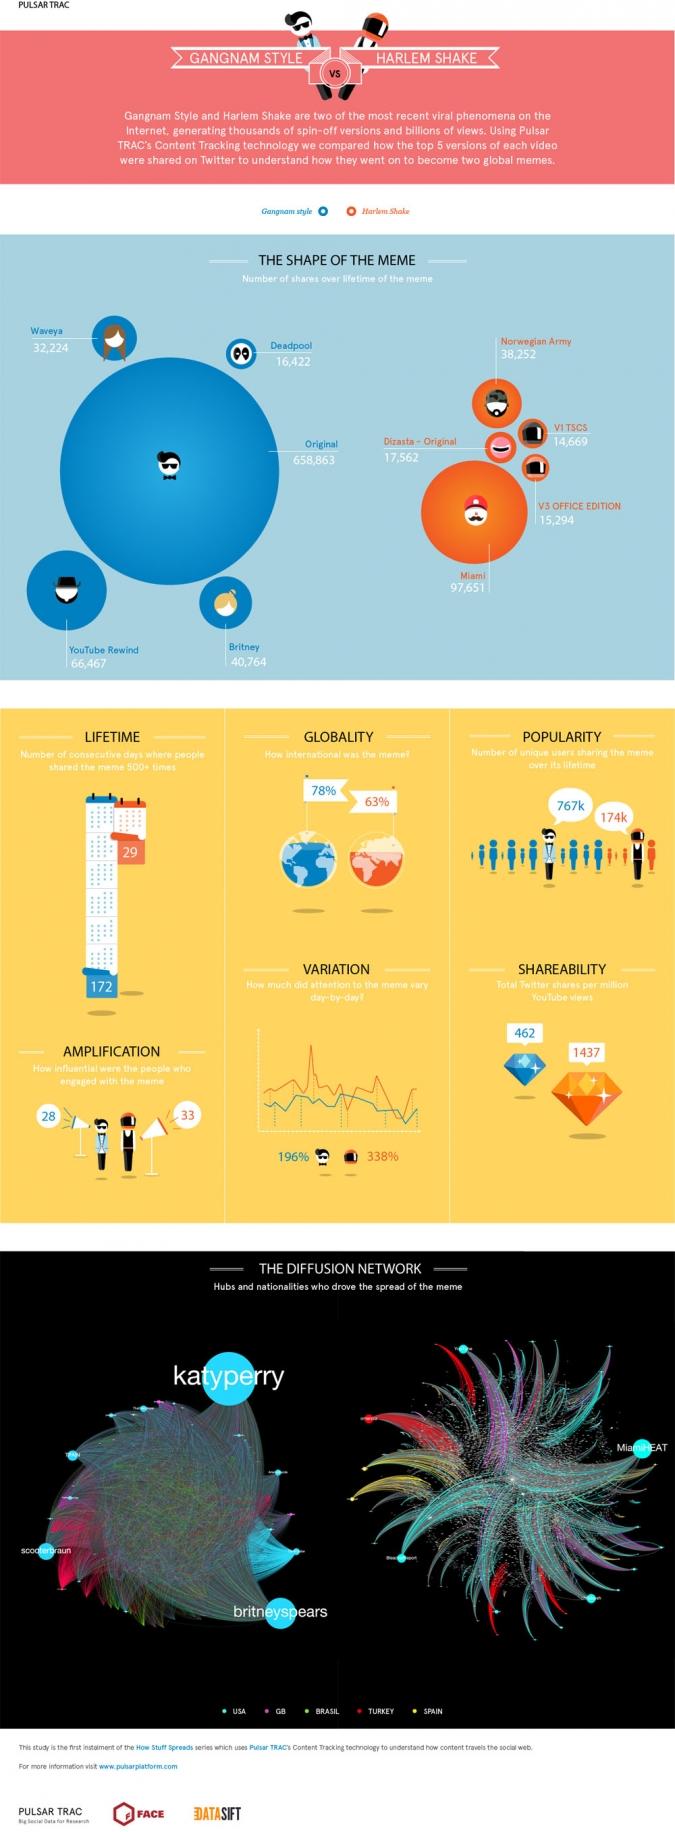 infografik-virale-videos-auf-twitter-gangnam-style-harlem-shake-viral-marketing-effekte